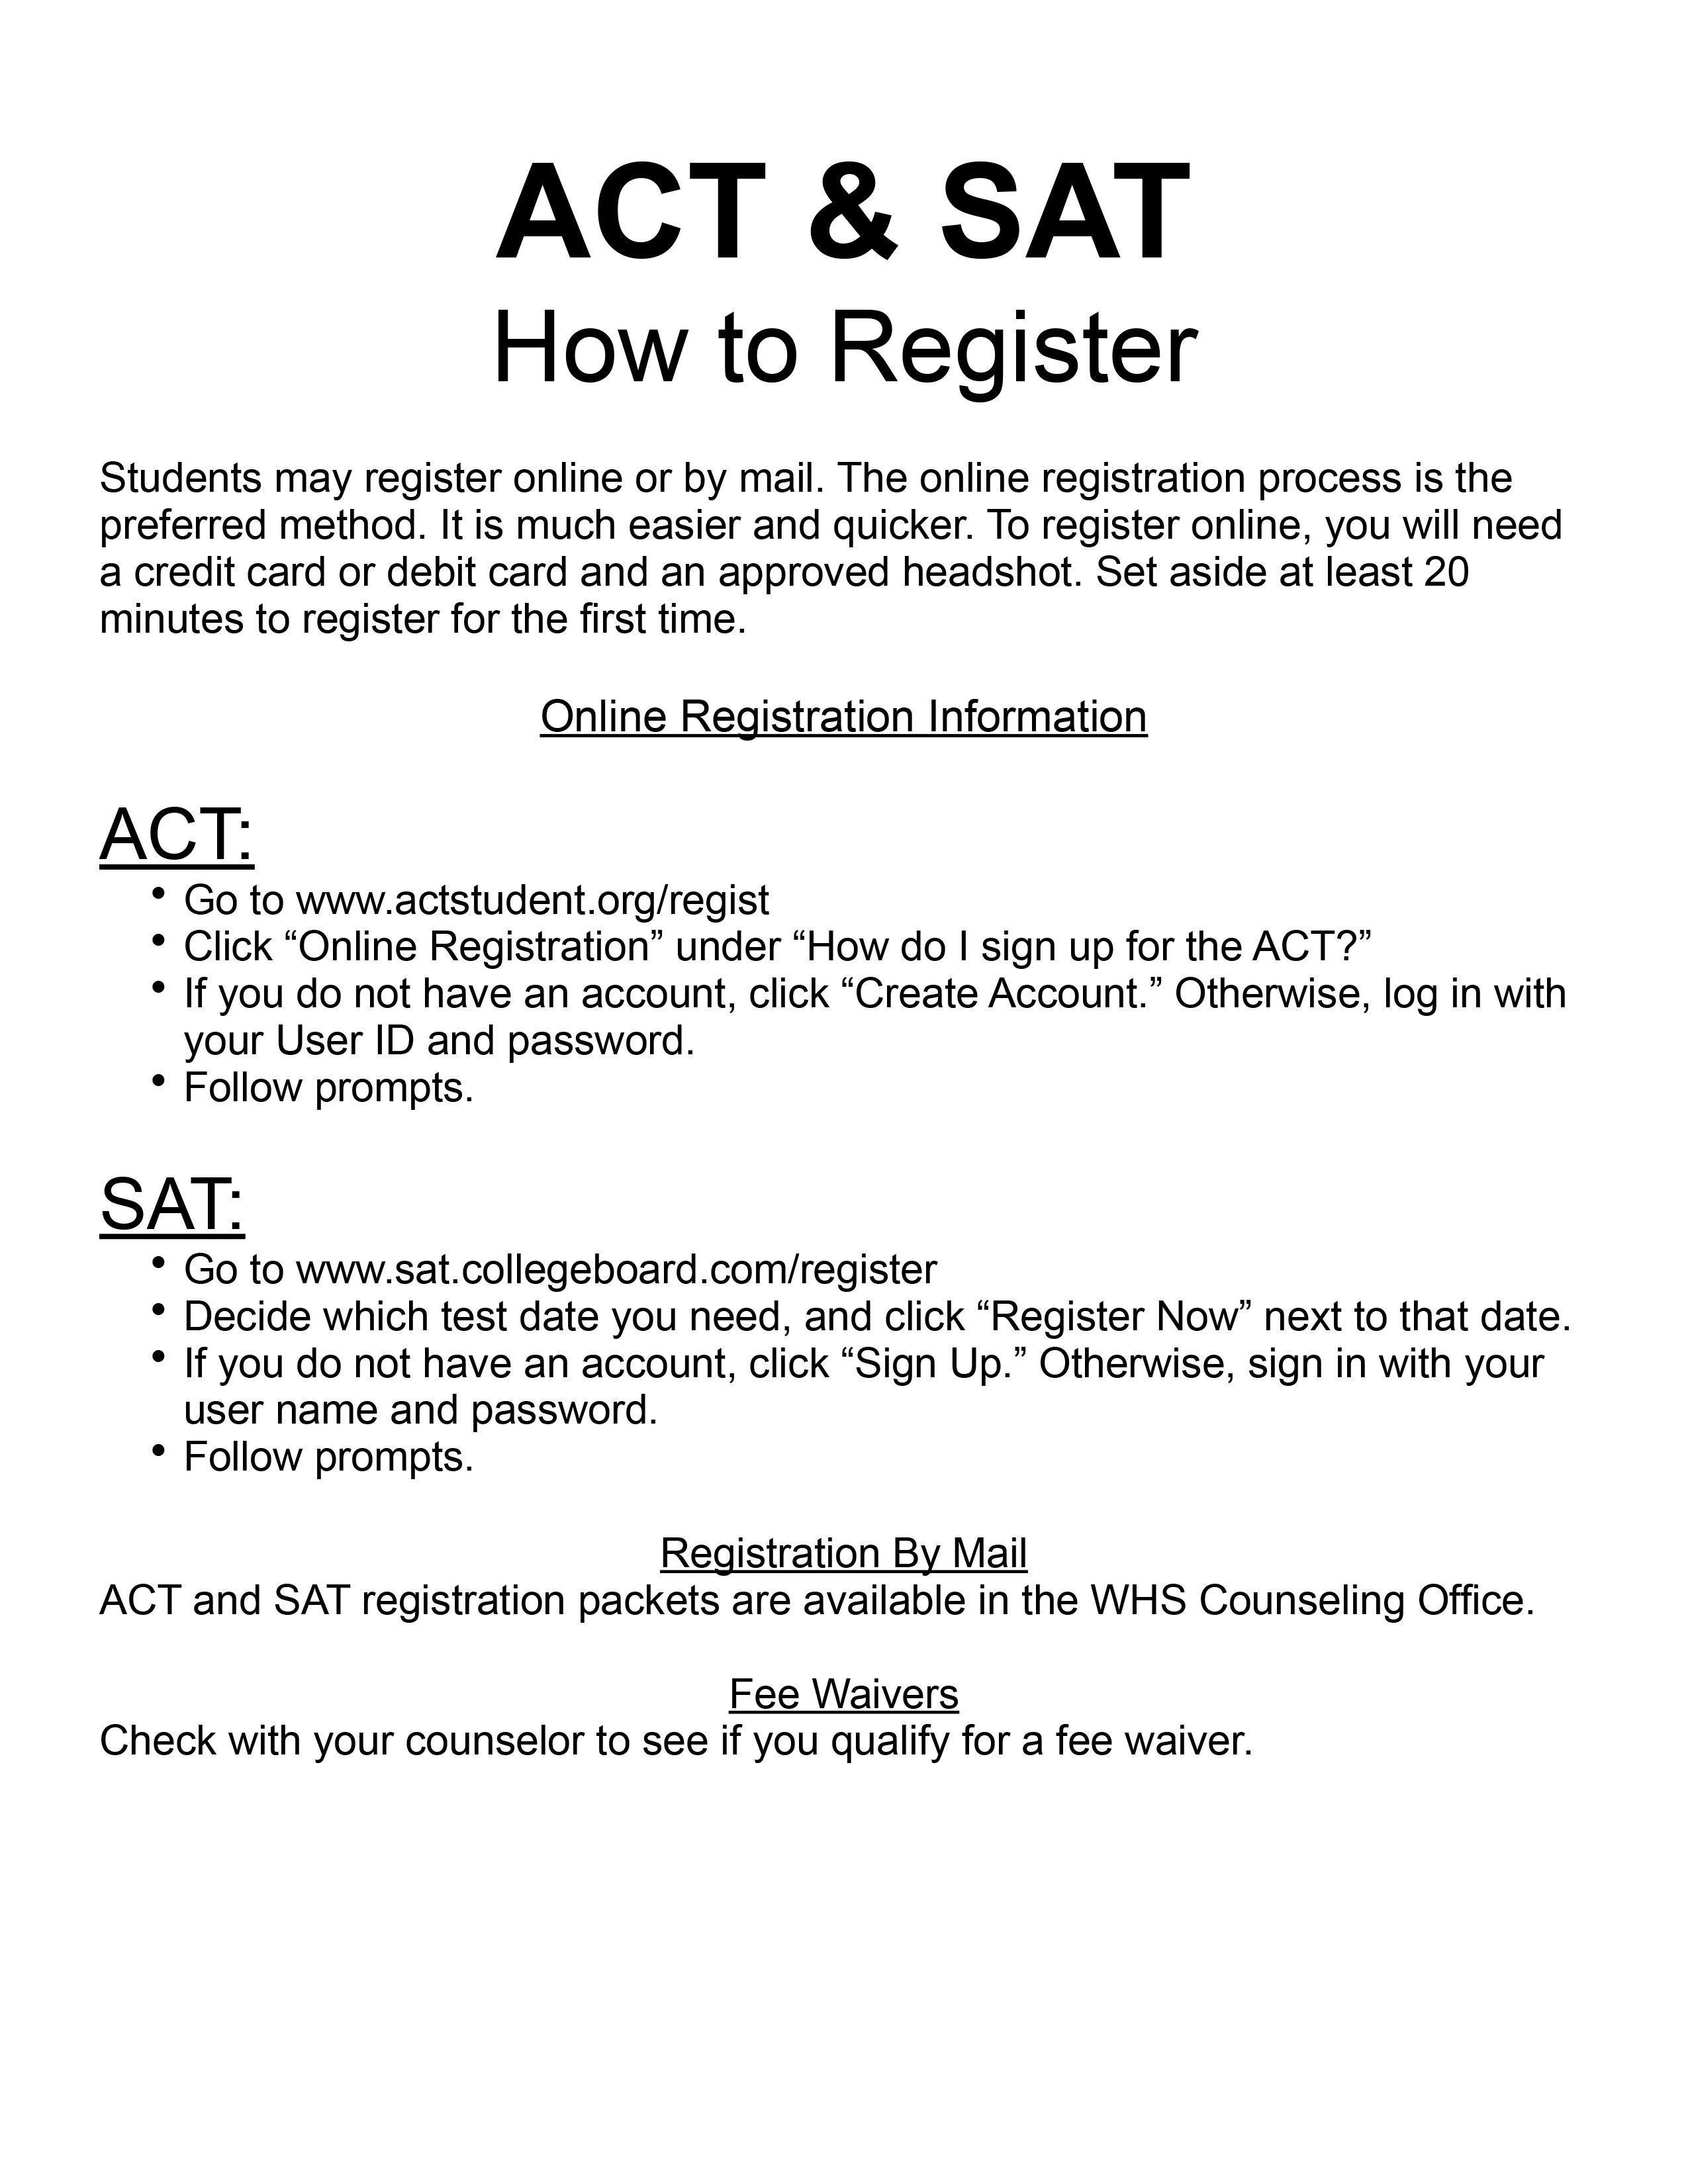 ACT/SAT test registration instructions